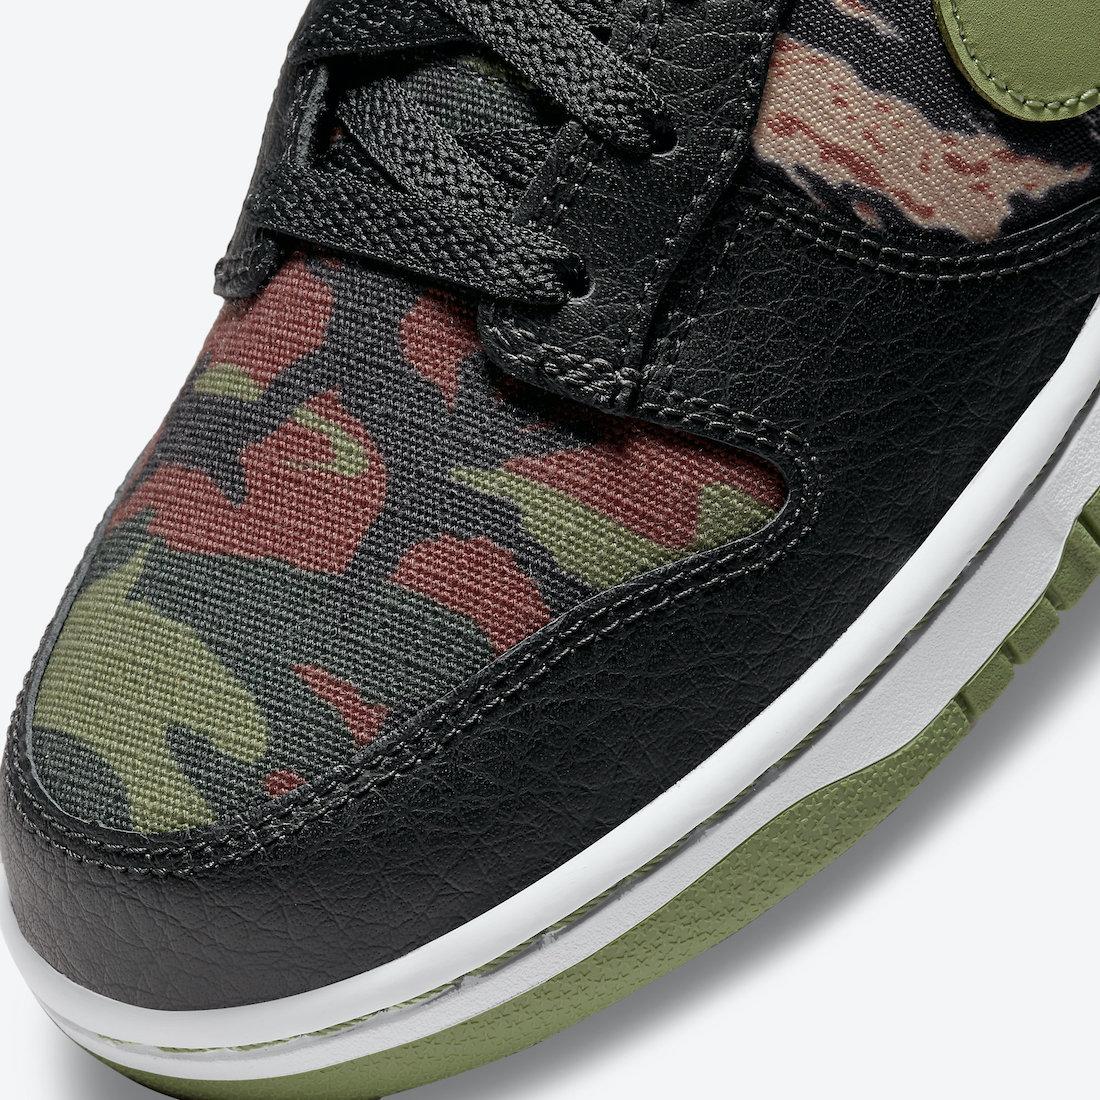 Nike-Dunk-Low-Black-Multi-Camo-DH0957-001-Release-Date-6